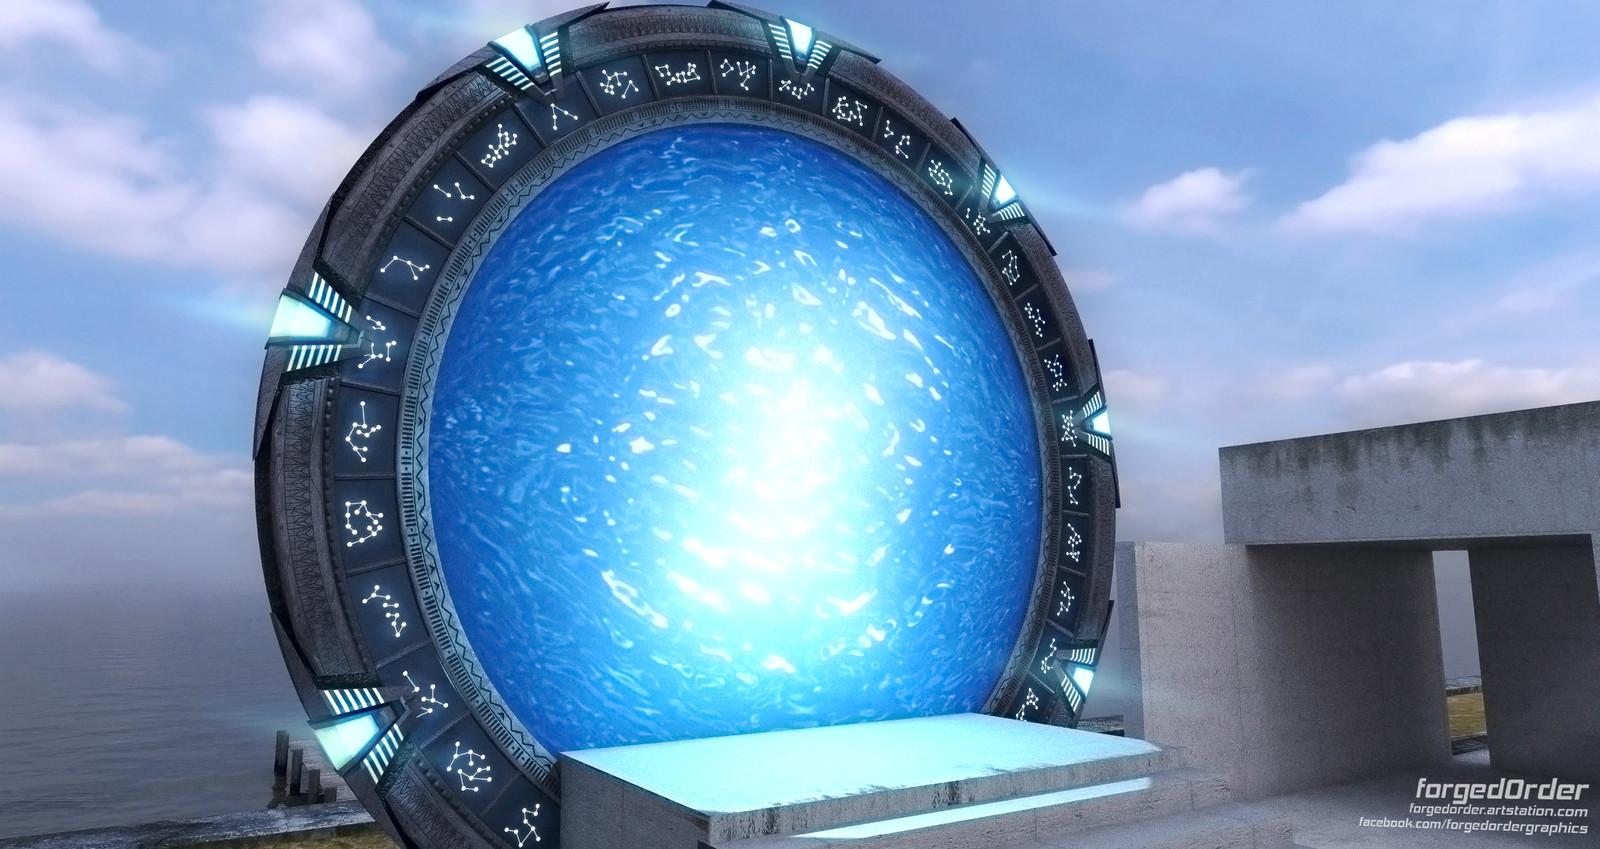 Pegasus Stargate from Stargate Atlantis